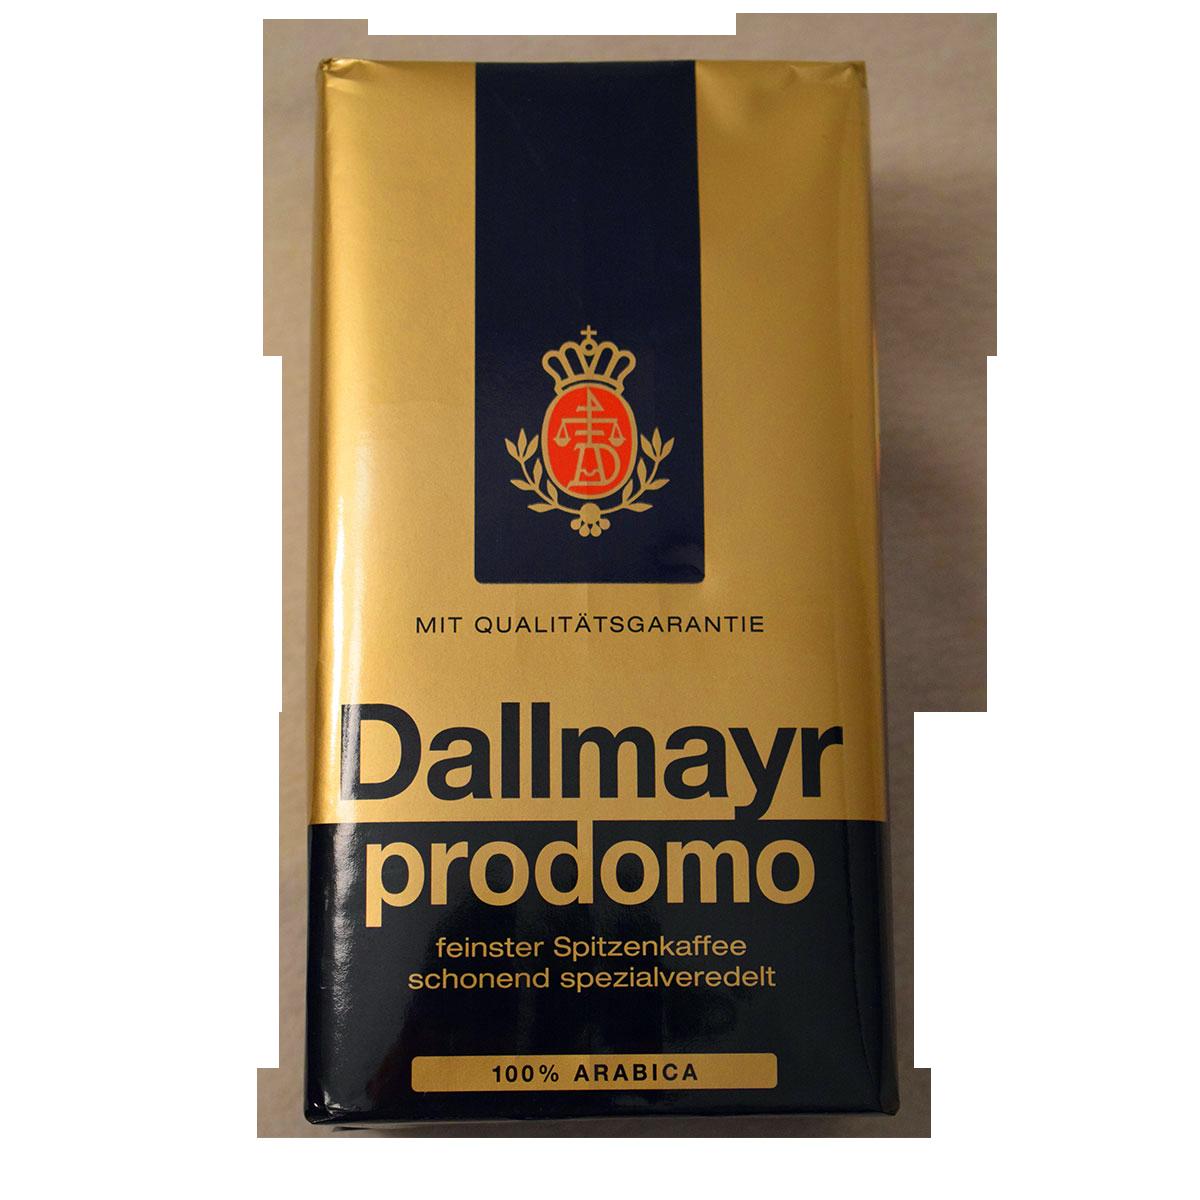 Dallmayr-Prodomo-500g